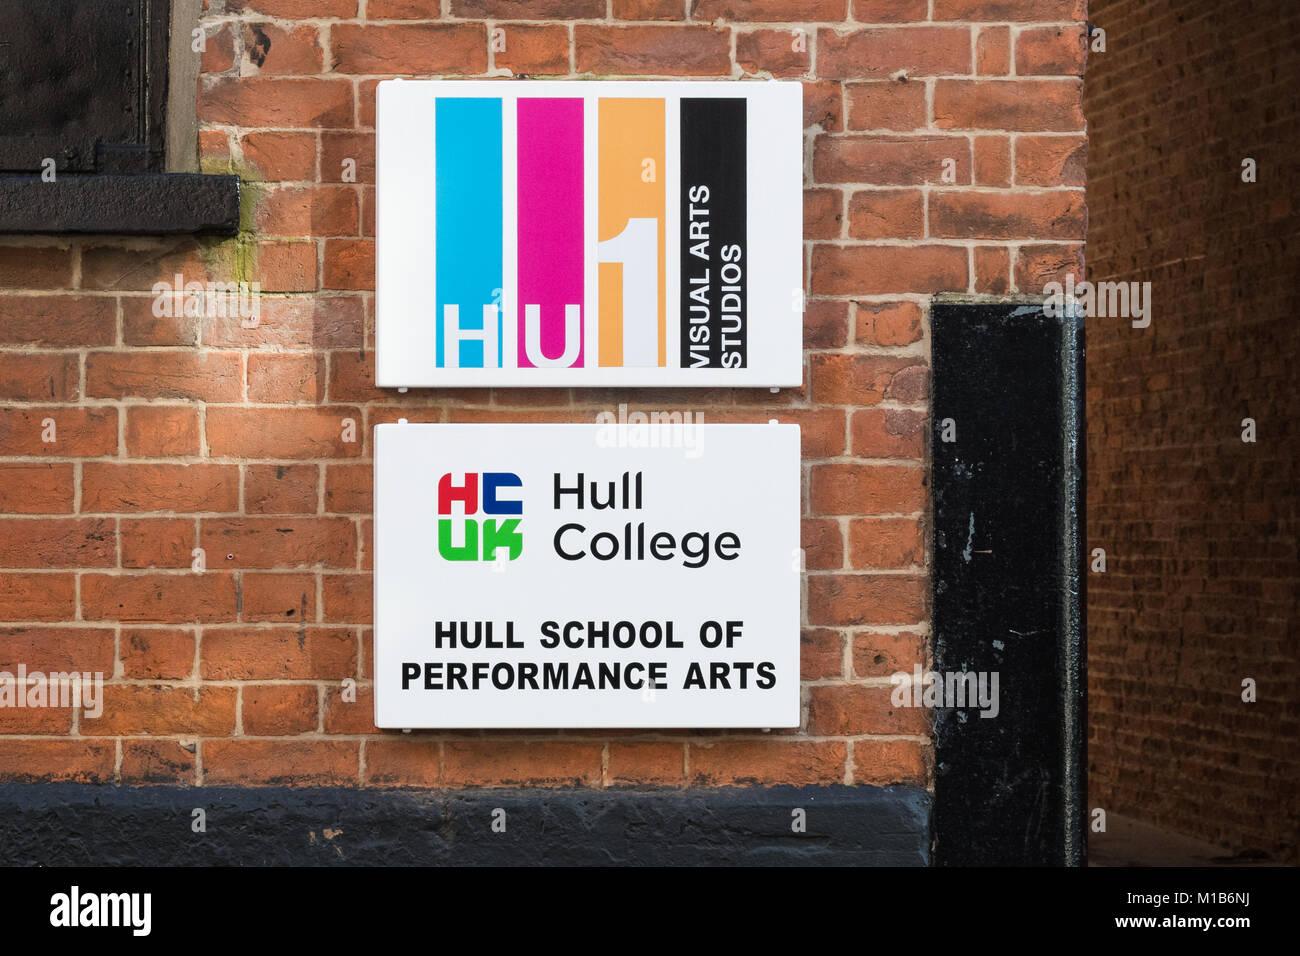 HU 1 Visual Arts Studios, Hull Schule der Performance Kunst, Hull College, Hull, England, Großbritannien Stockbild